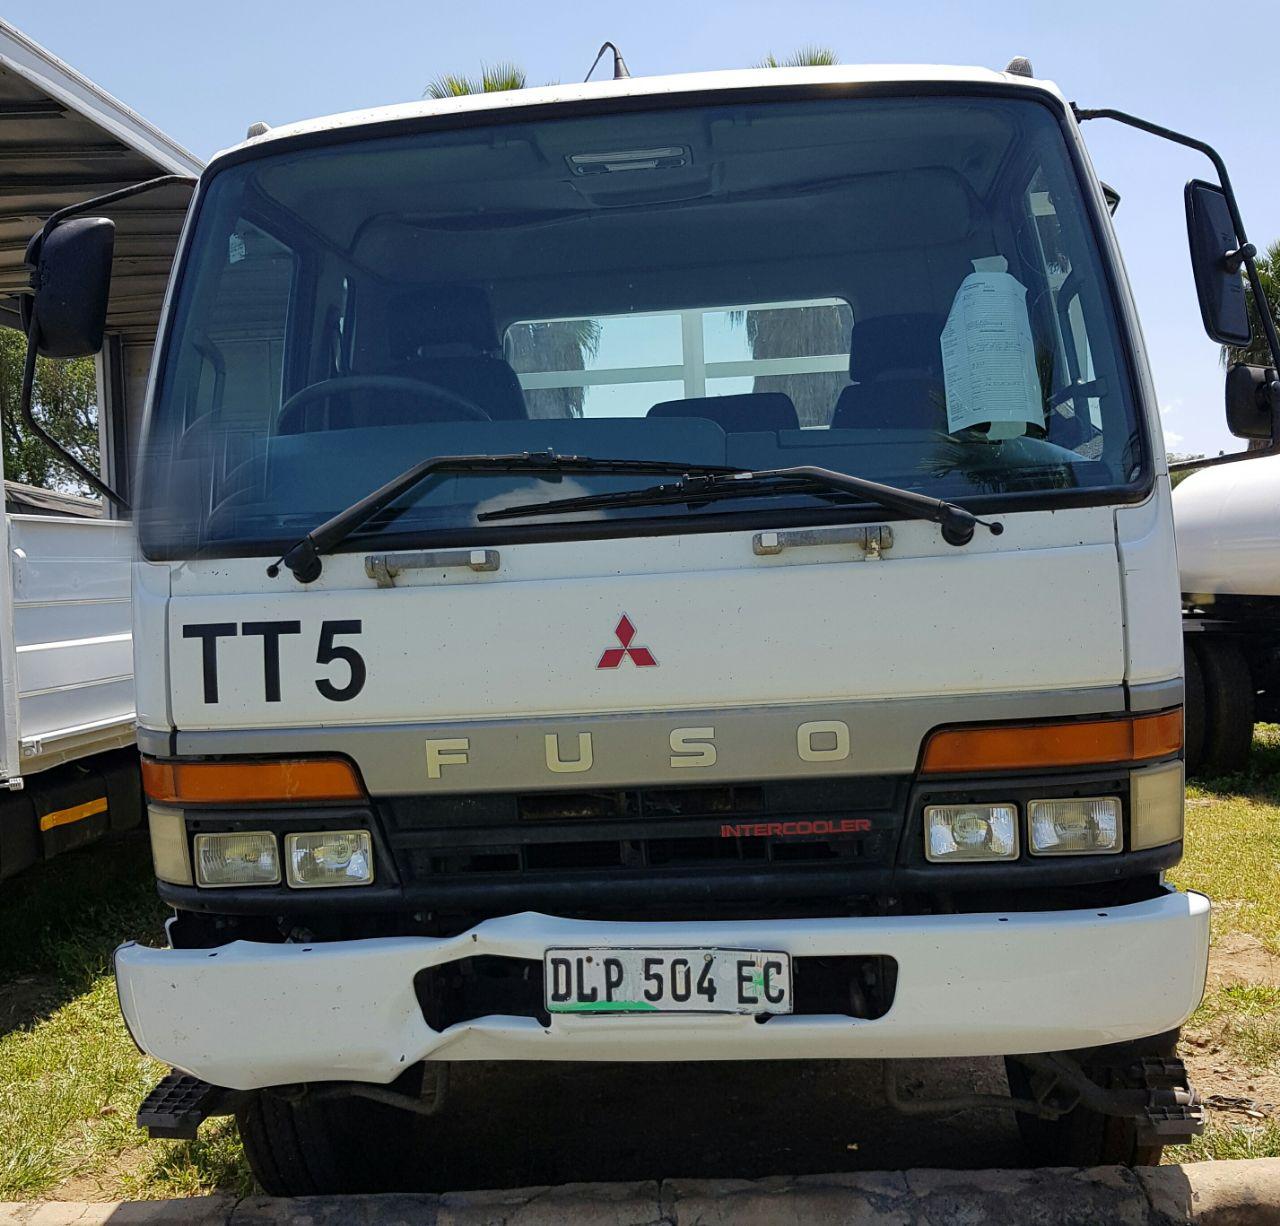 2005 Mitsubishi Fuso FM14-213 dropside truck for sale | Junk Mail